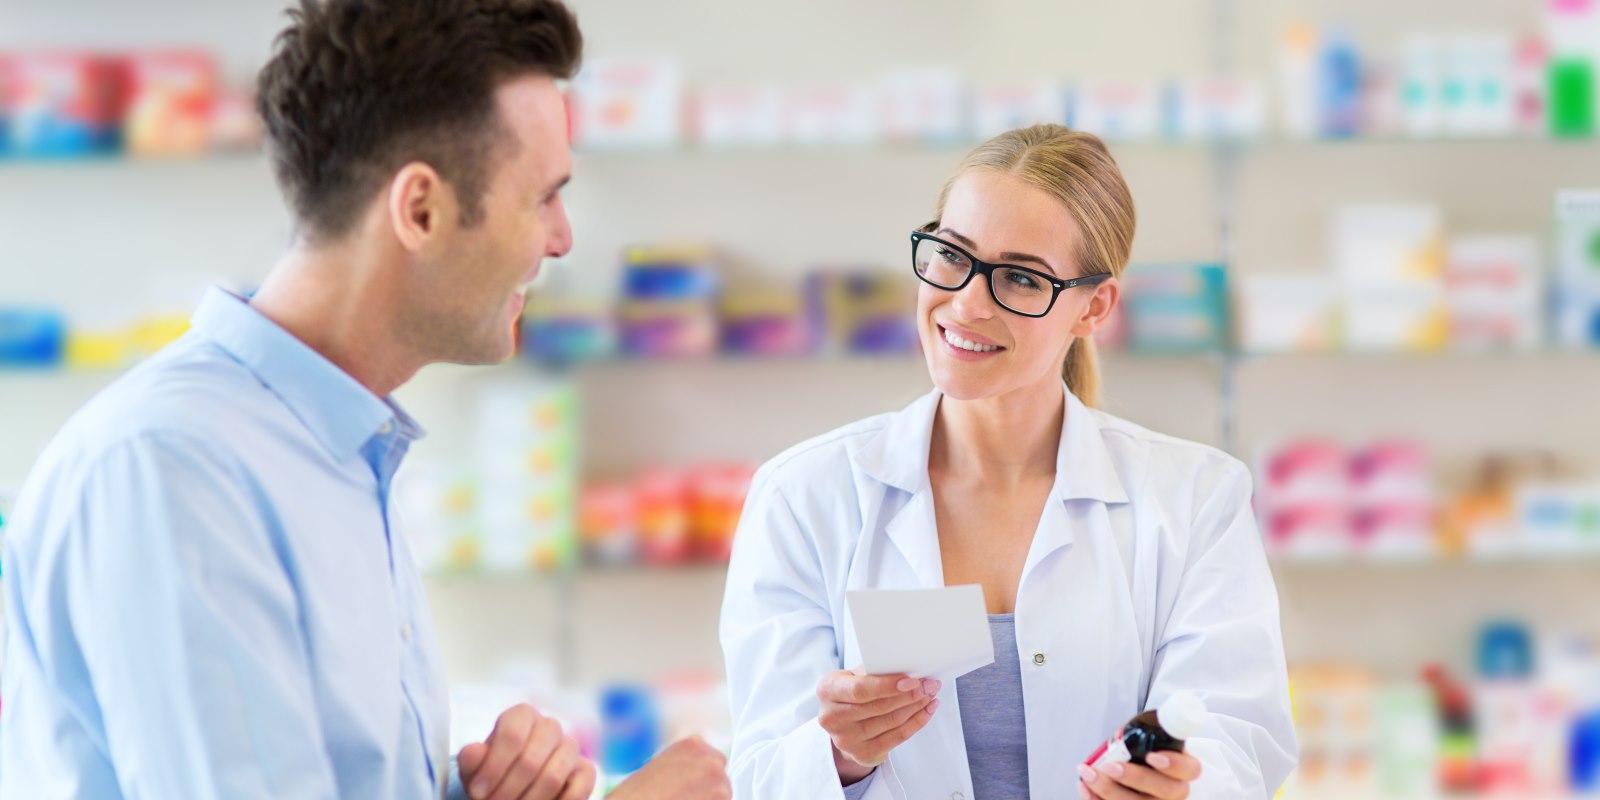 Einsatzfeld: Medical Advisor